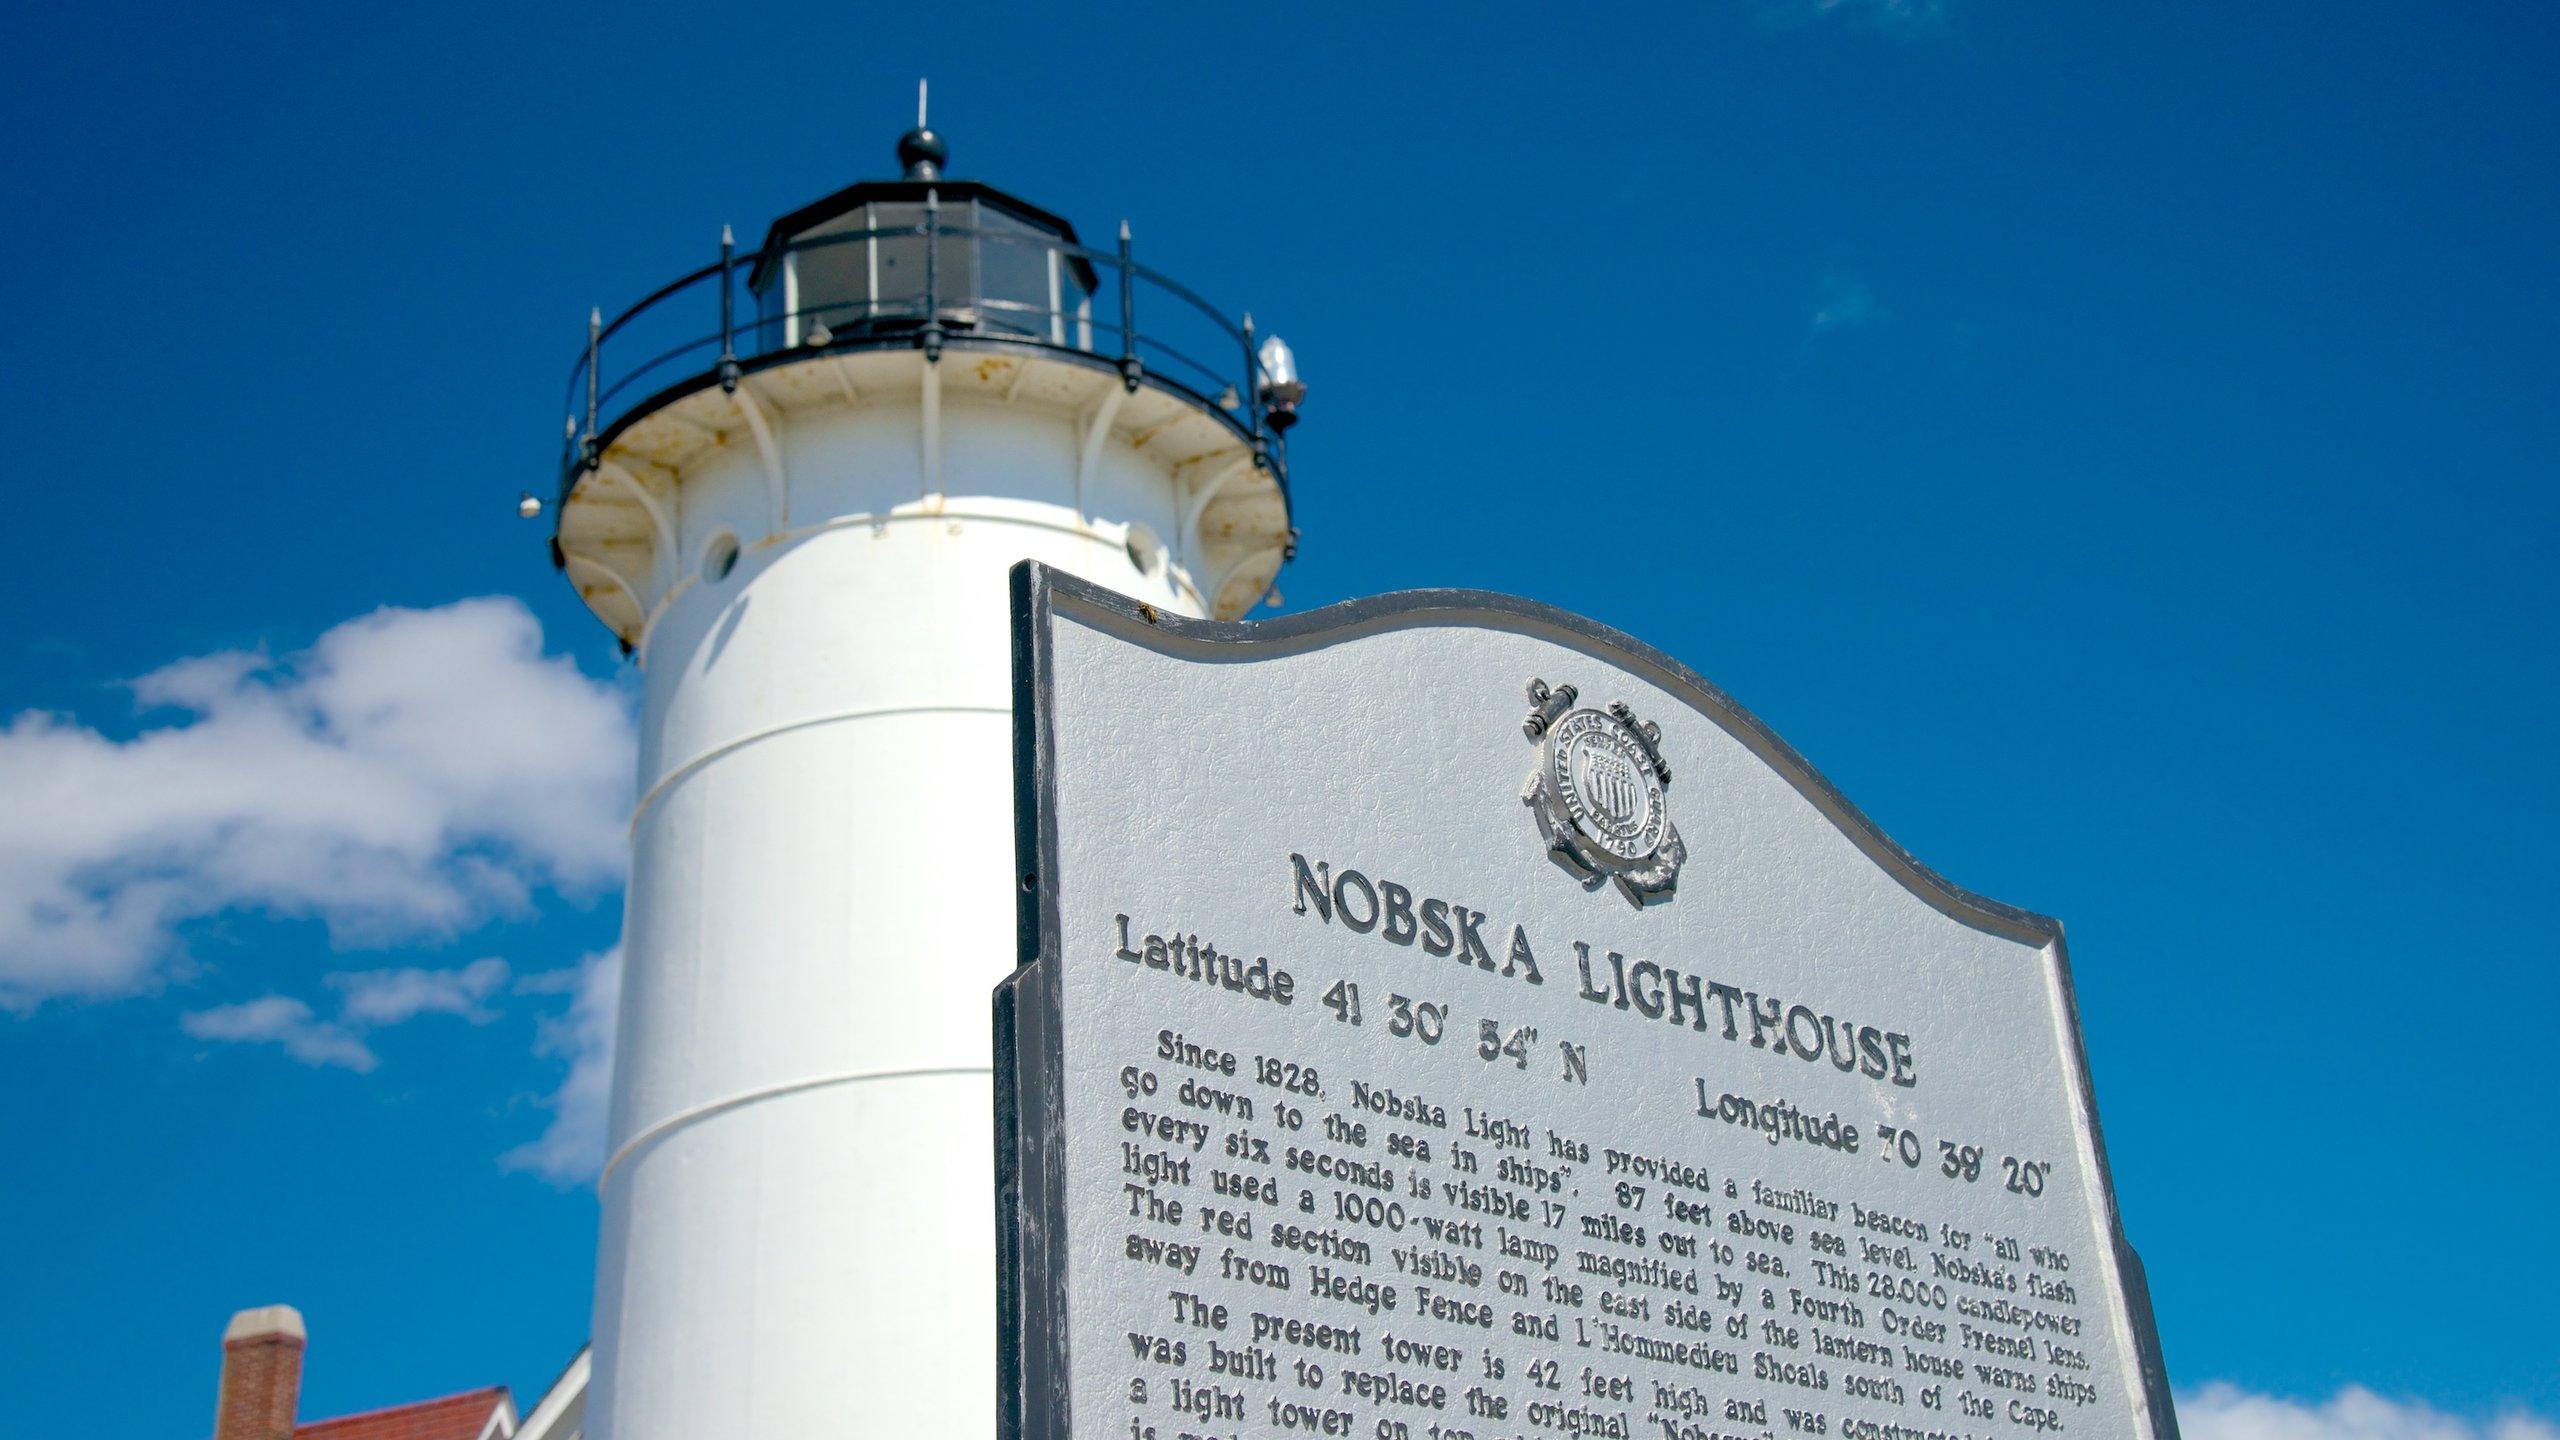 Nobska Lighthouse, Falmouth, Massachusetts, United States of America